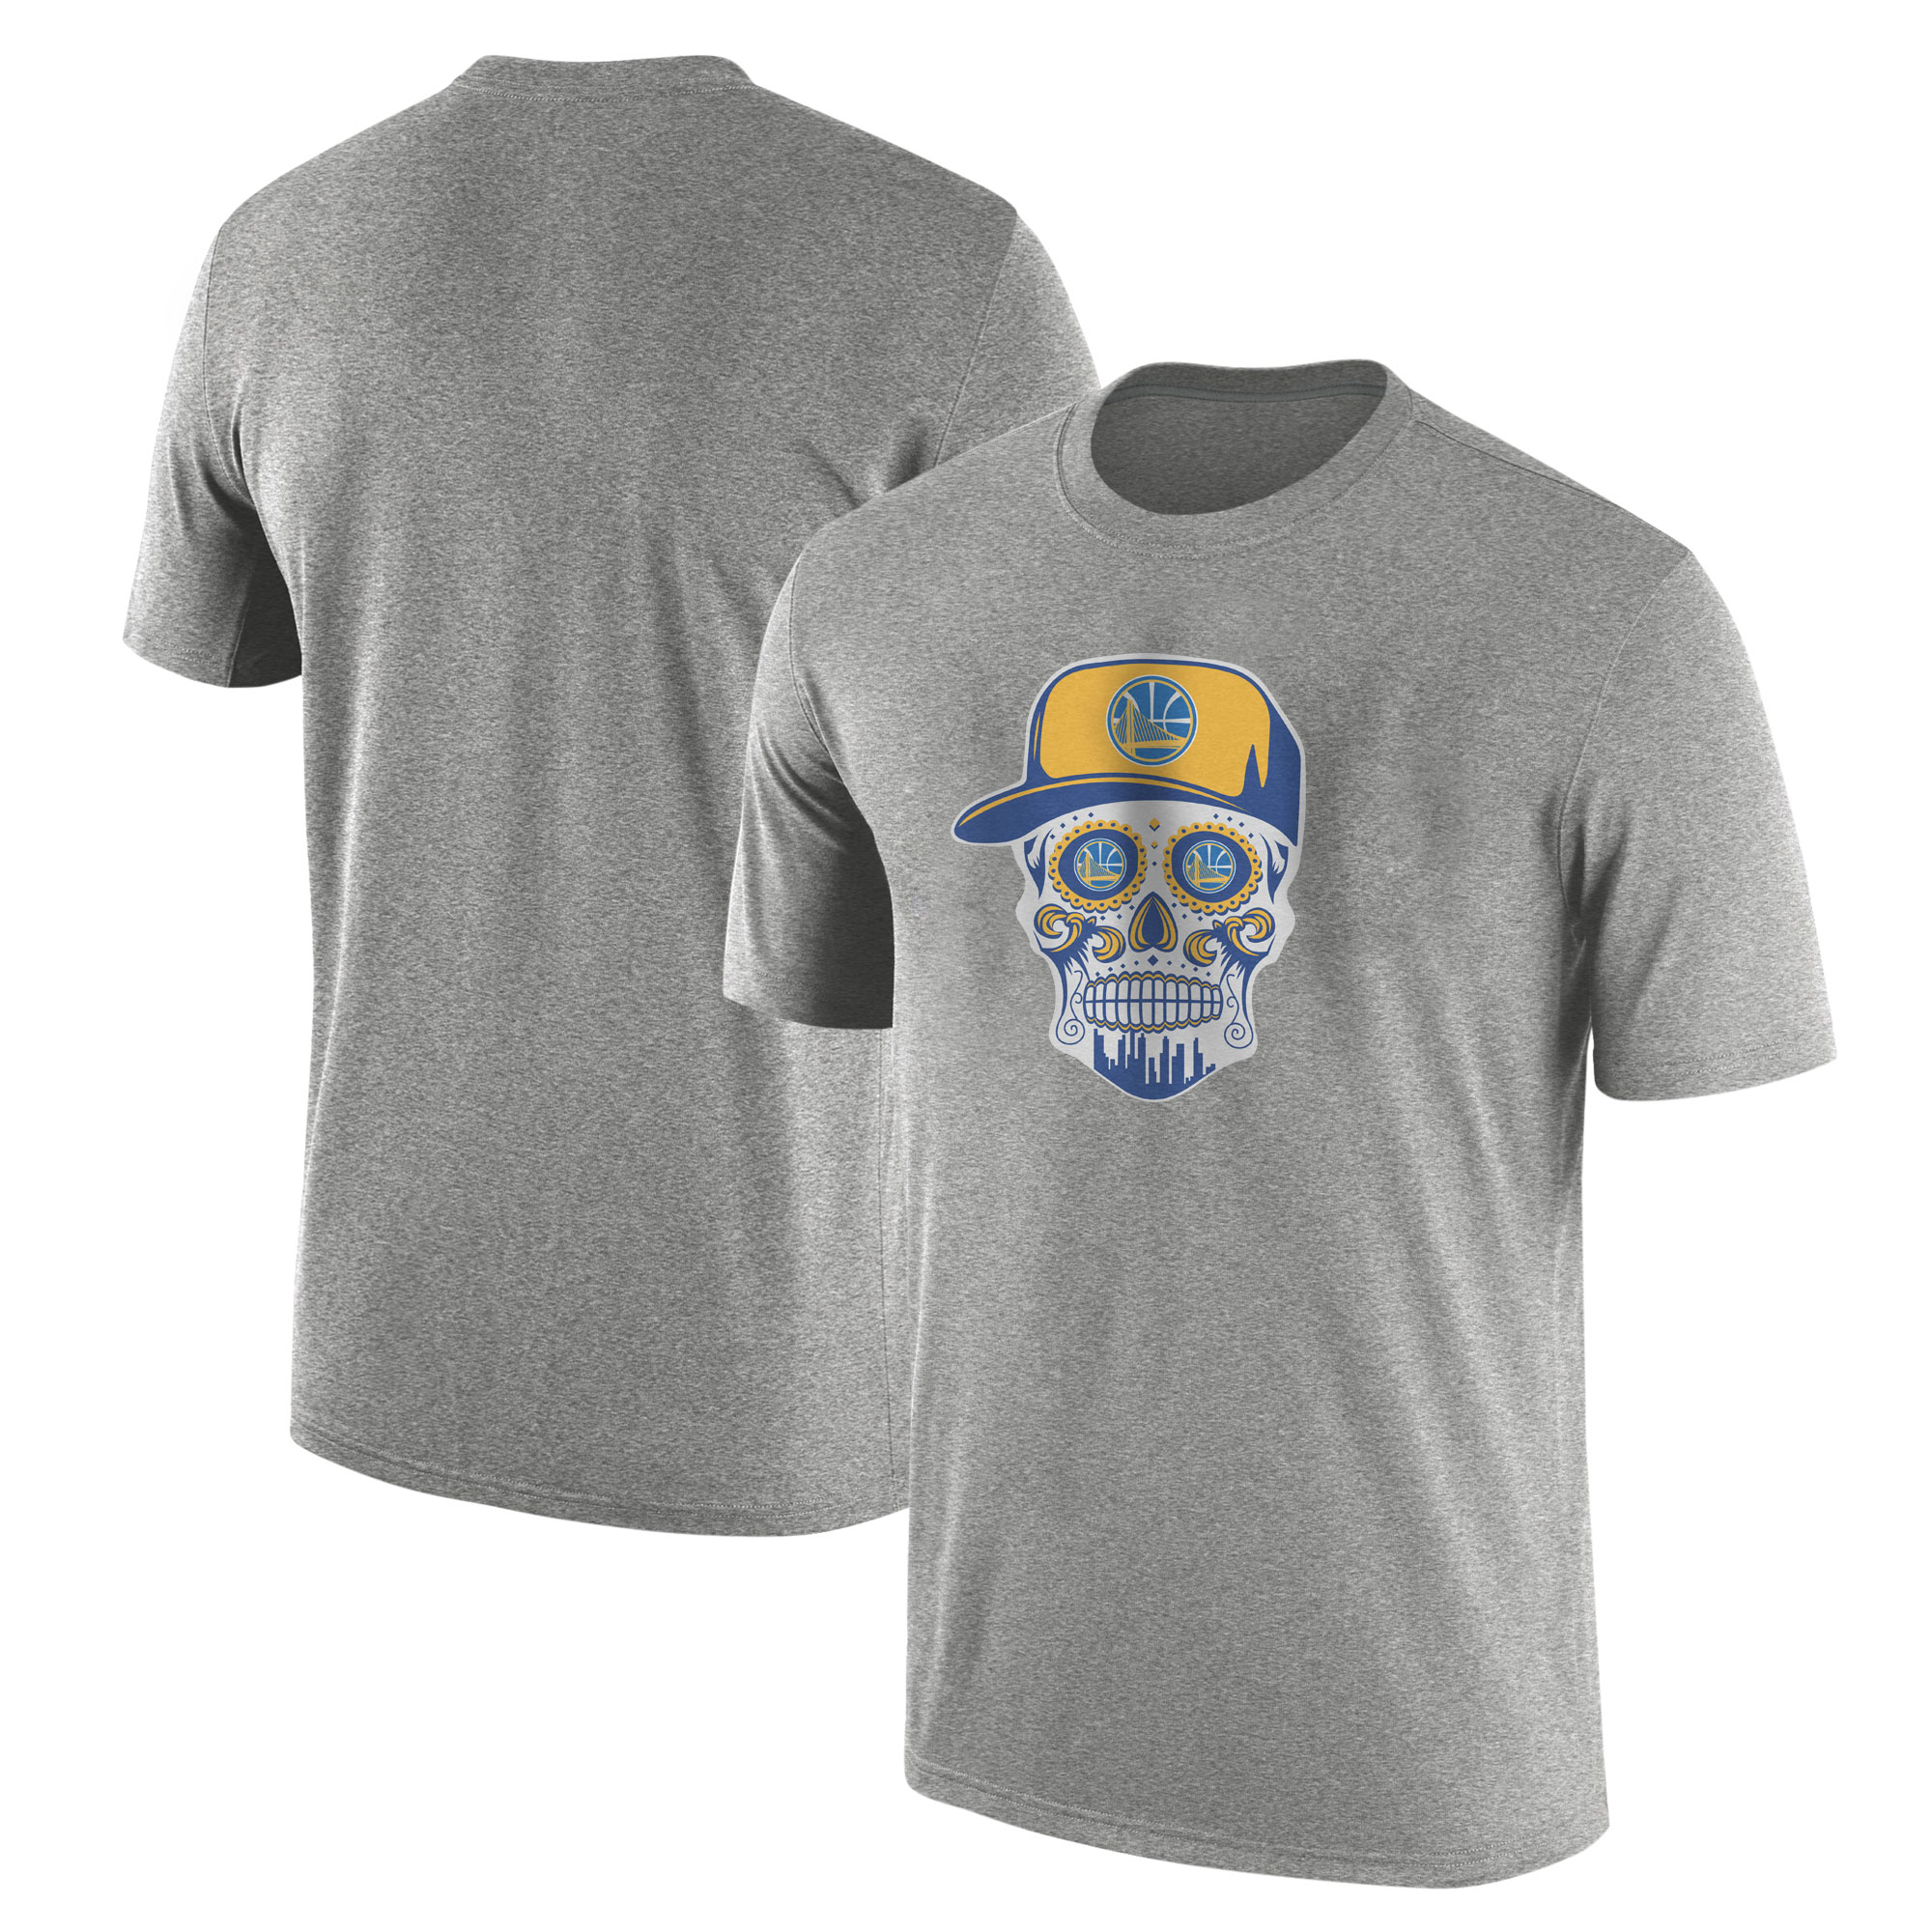 Warriors Skull Tshirt (TSH-GRY-NP-452-NBA-GSW-SKULL)